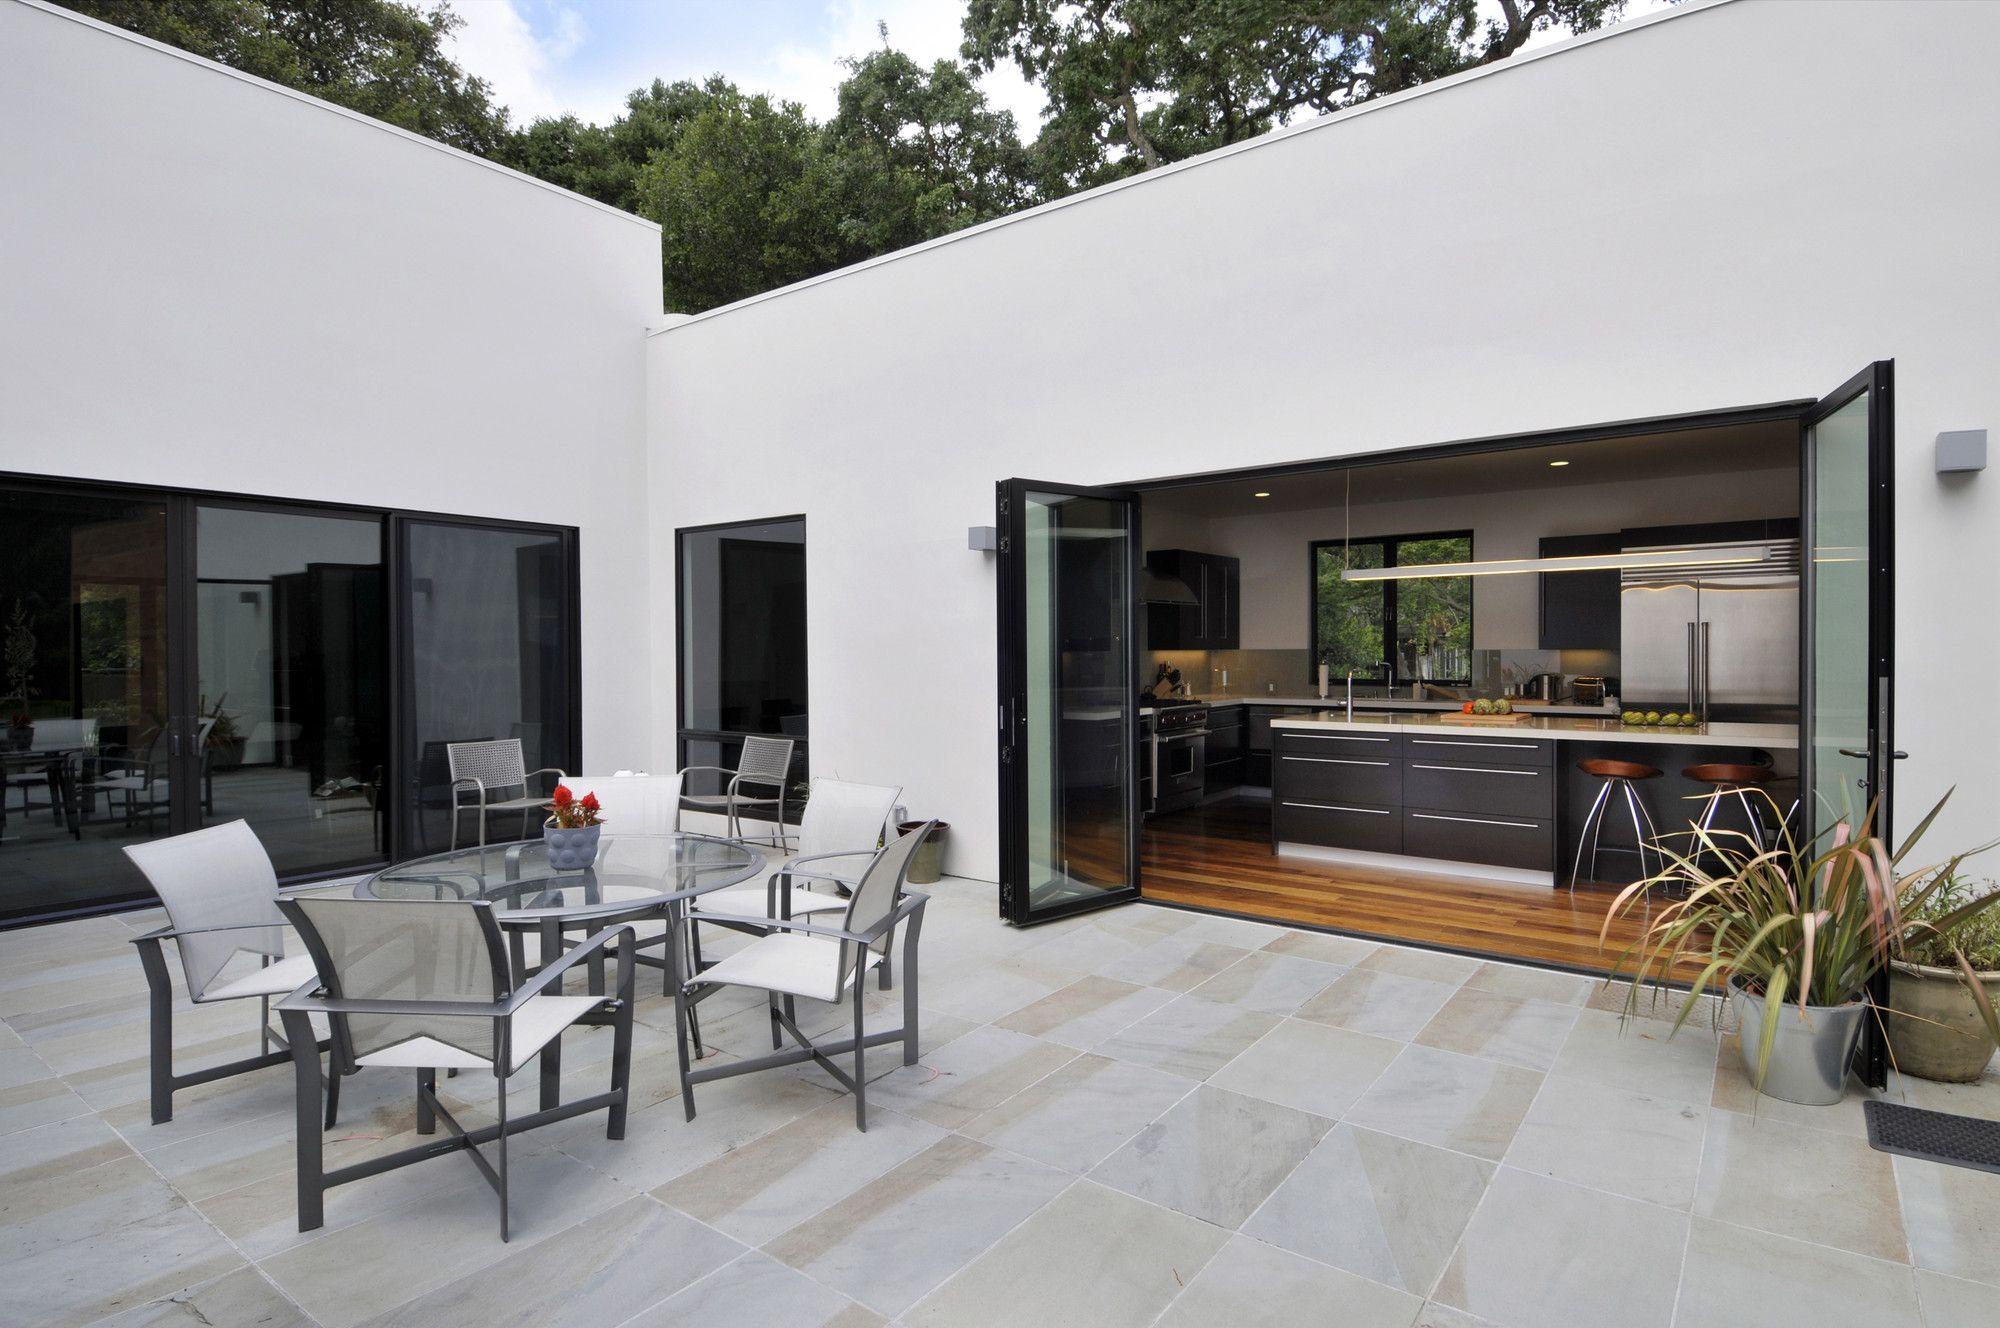 Gallery of Menlo Oaks Residence / Ana Williamson Architect - 6